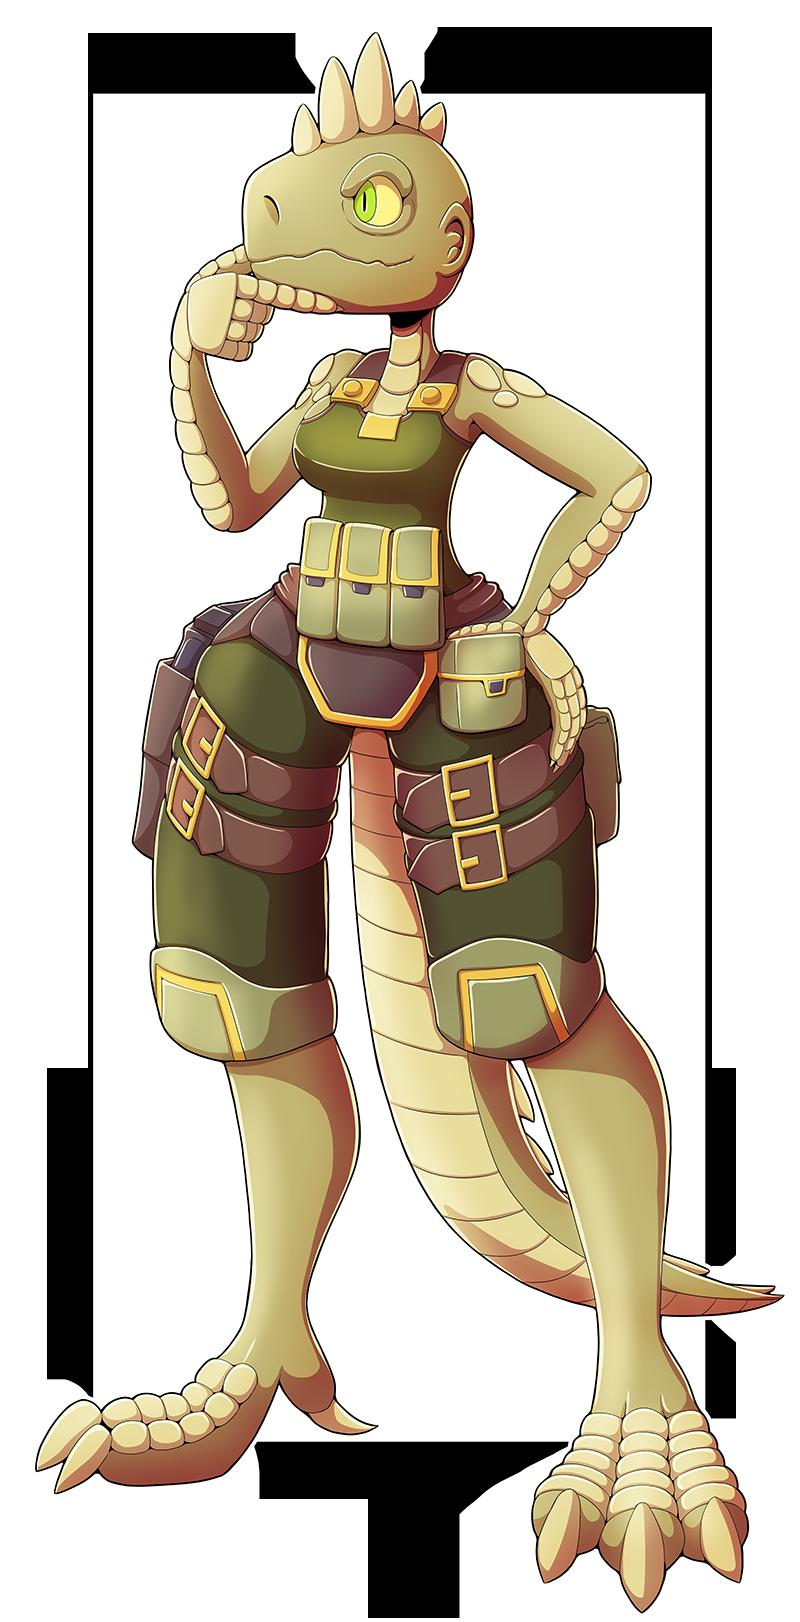 Ansley Lizard by Ragadabah